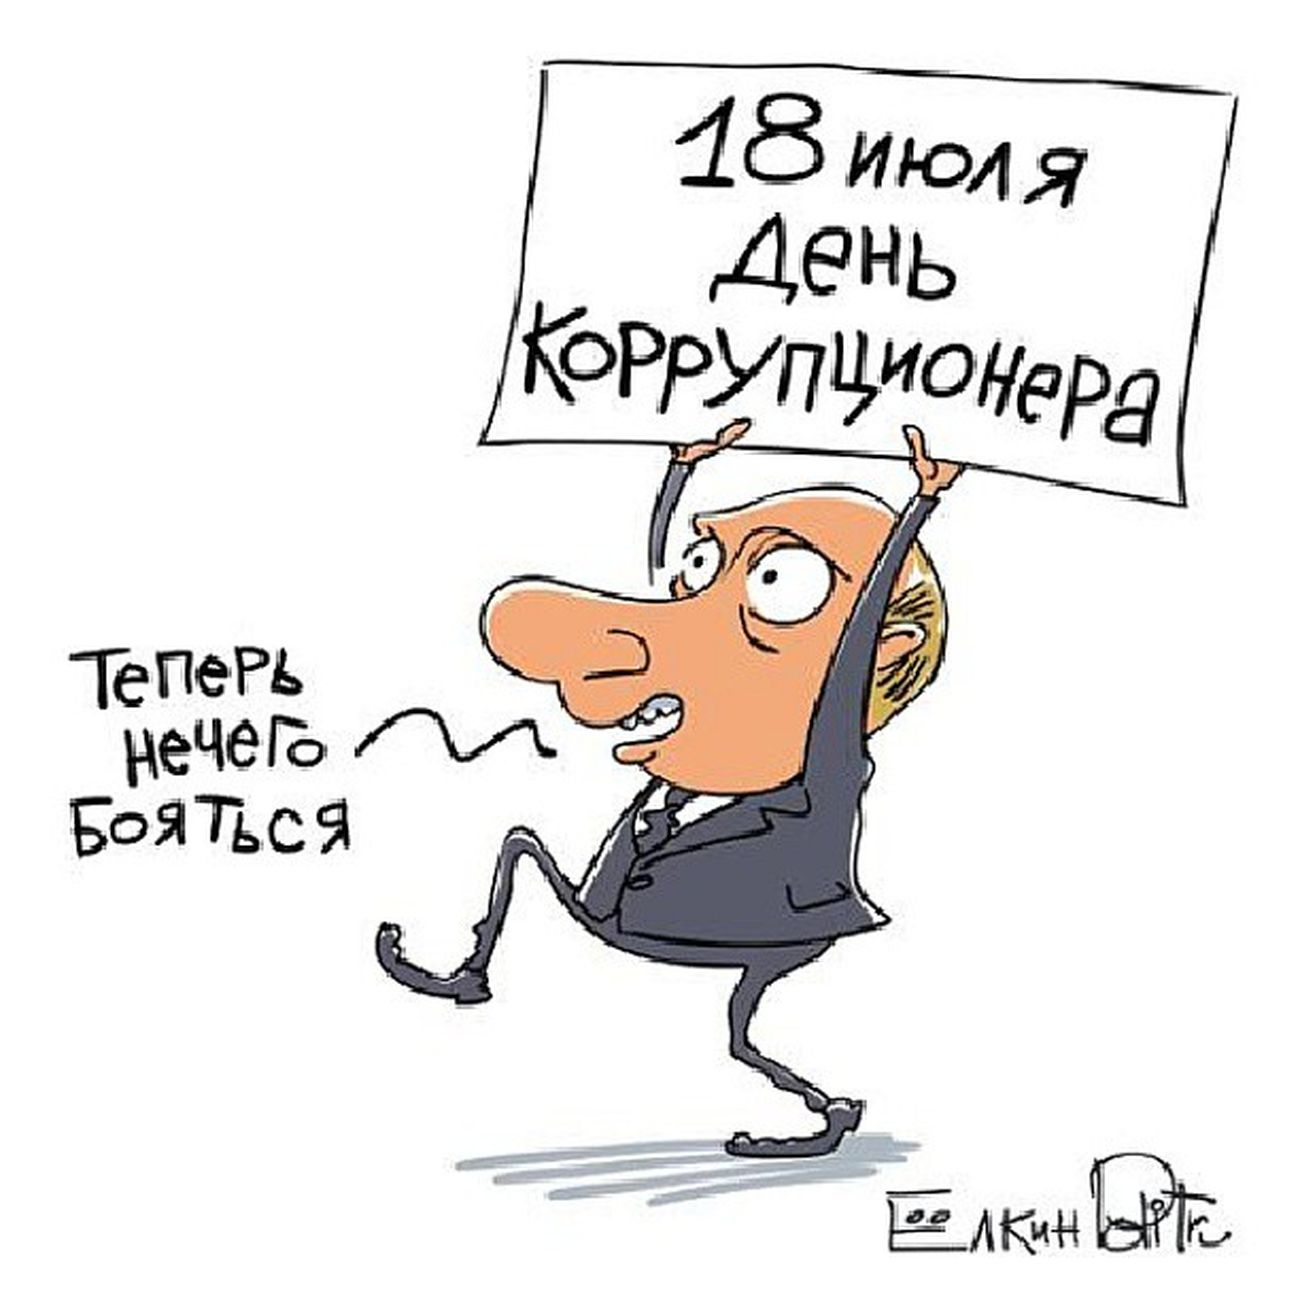 Navalniy Russia Elkin Ёлкин всё чудесатее и чудесатее